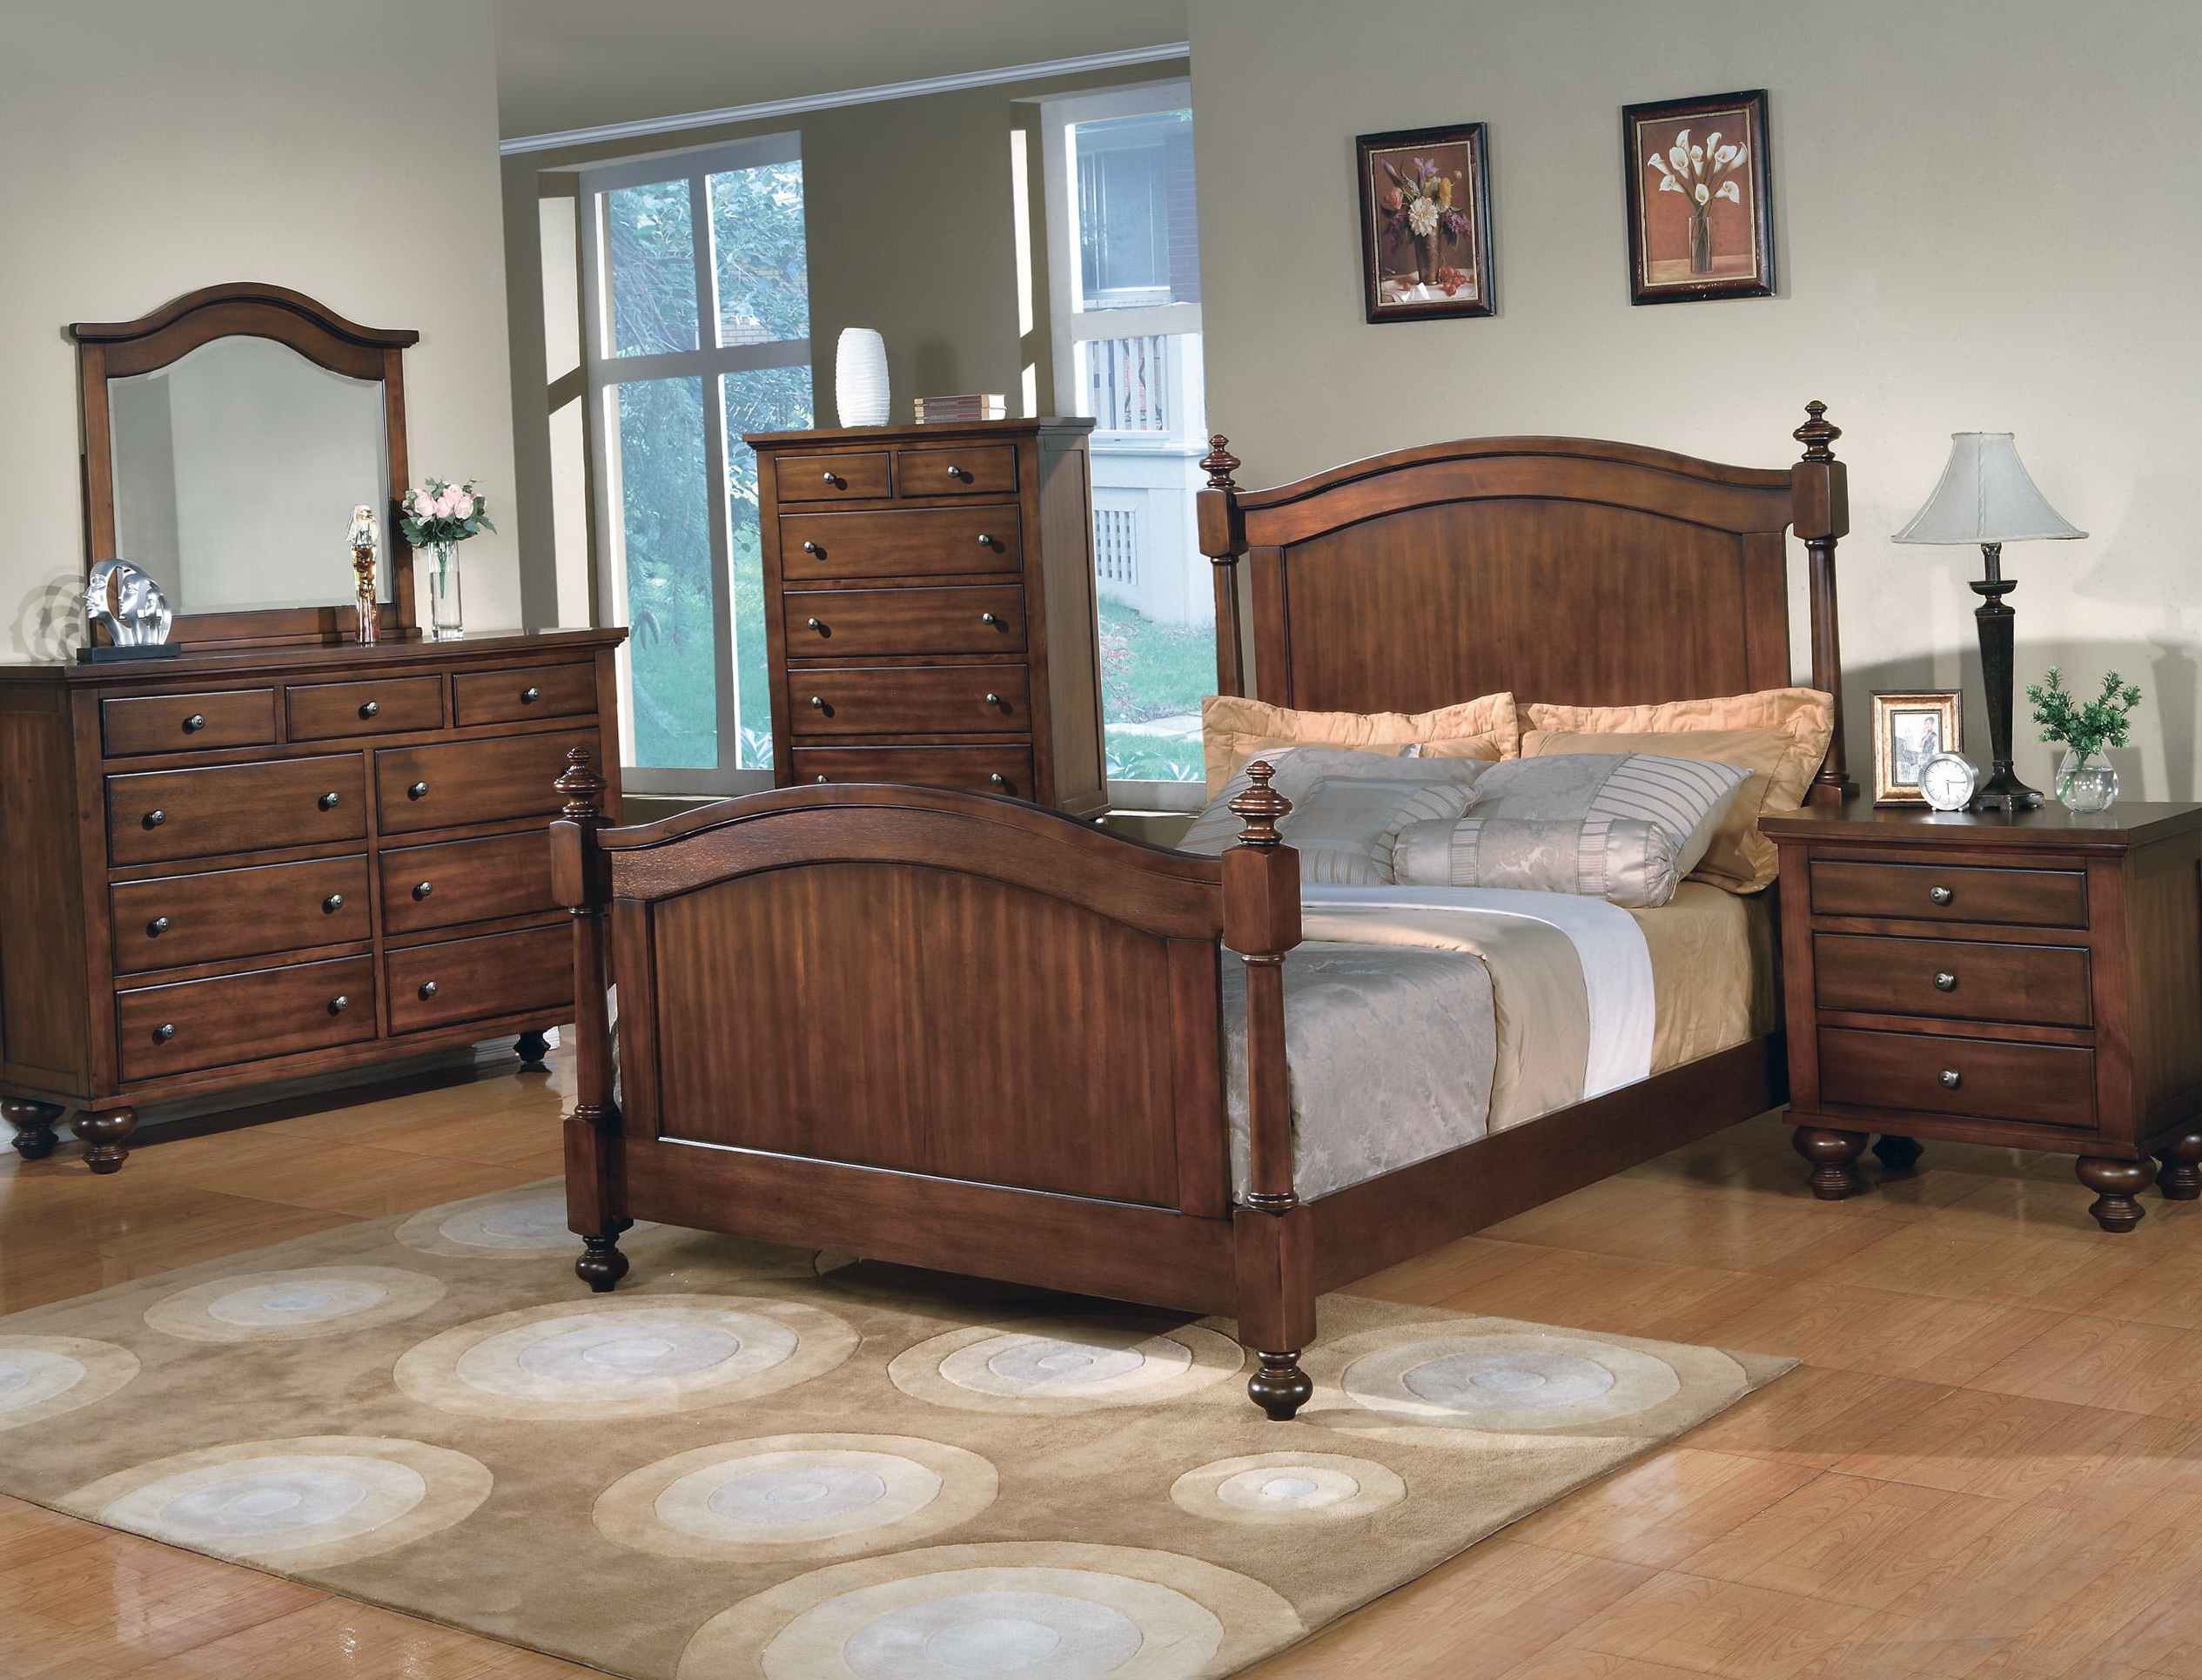 Texas Rustic Bedroom Furniture